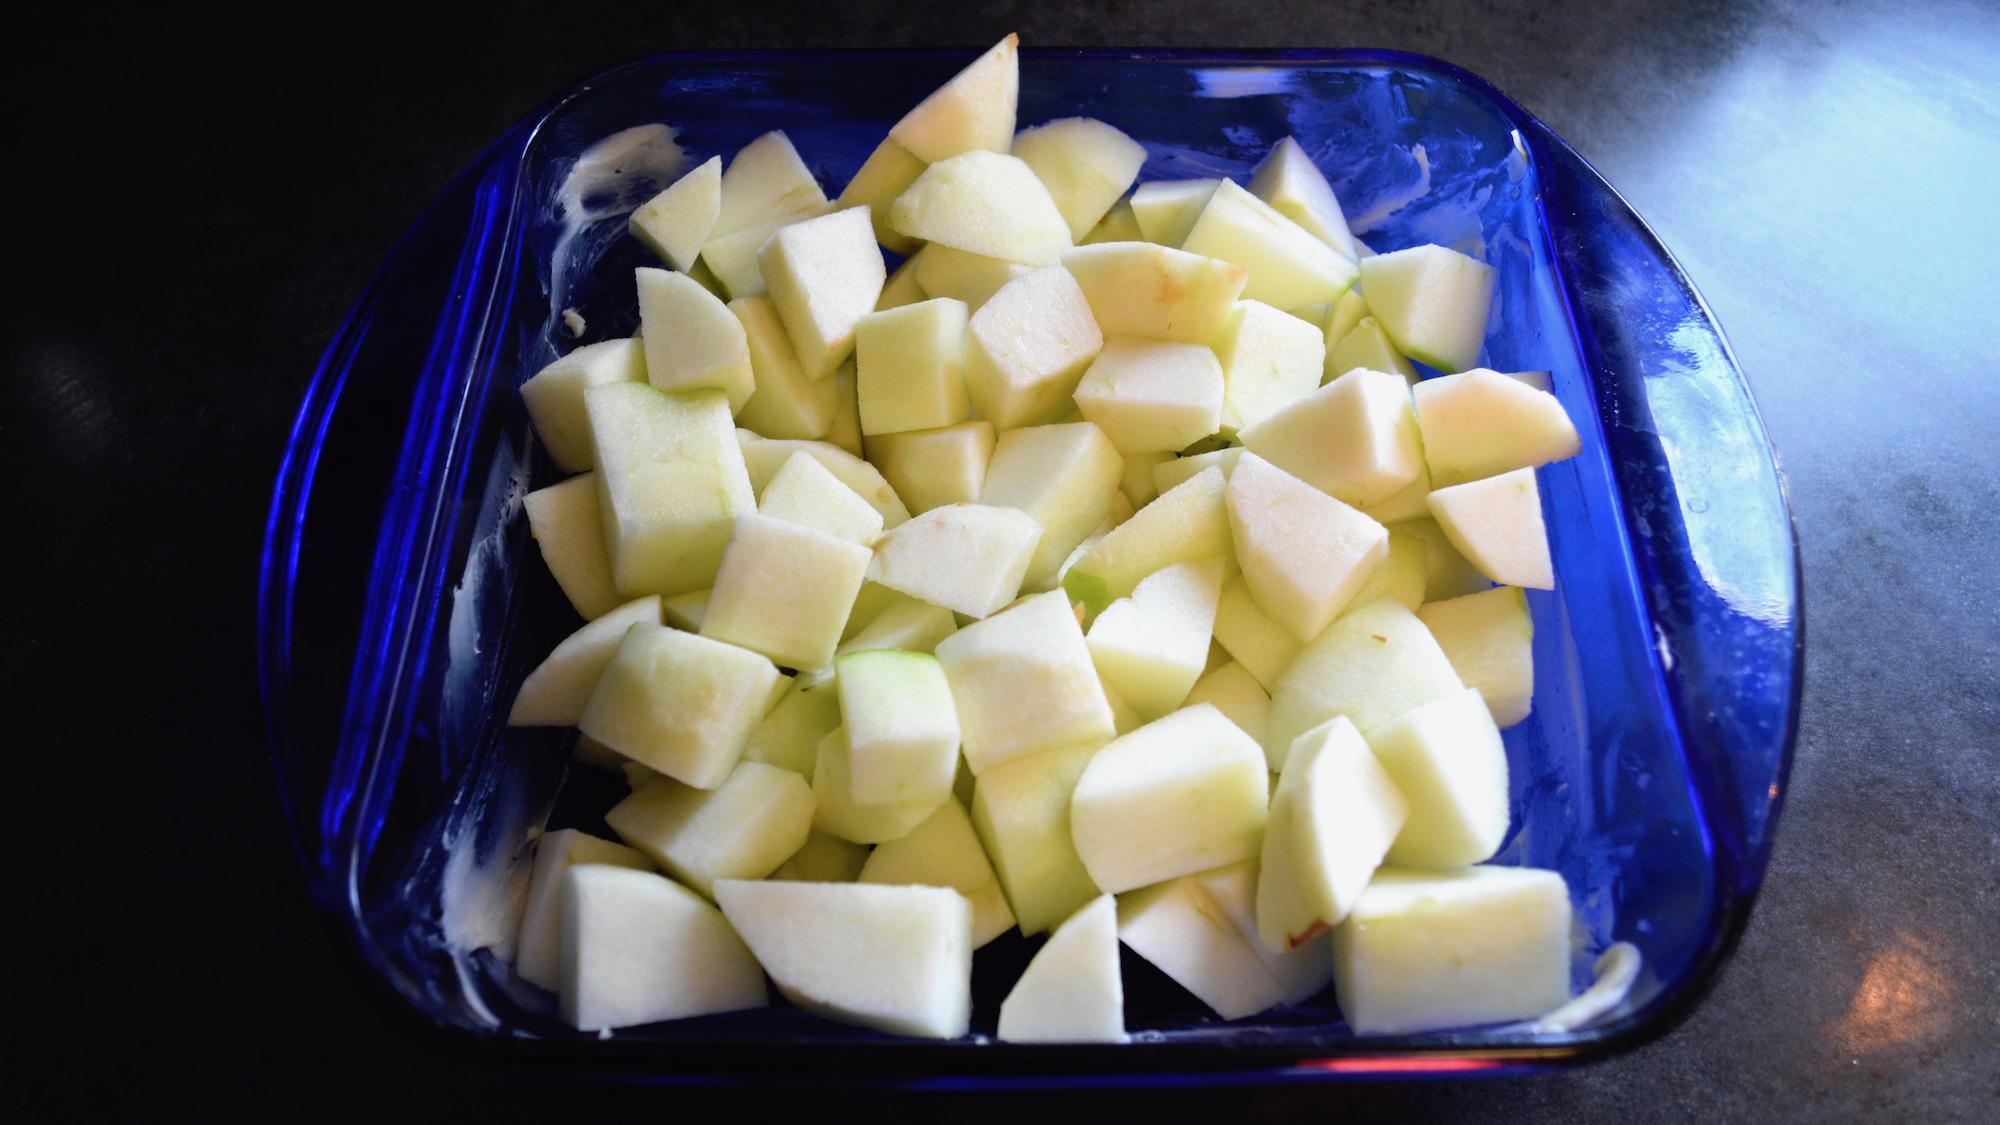 FMA_chopped apples.jpg